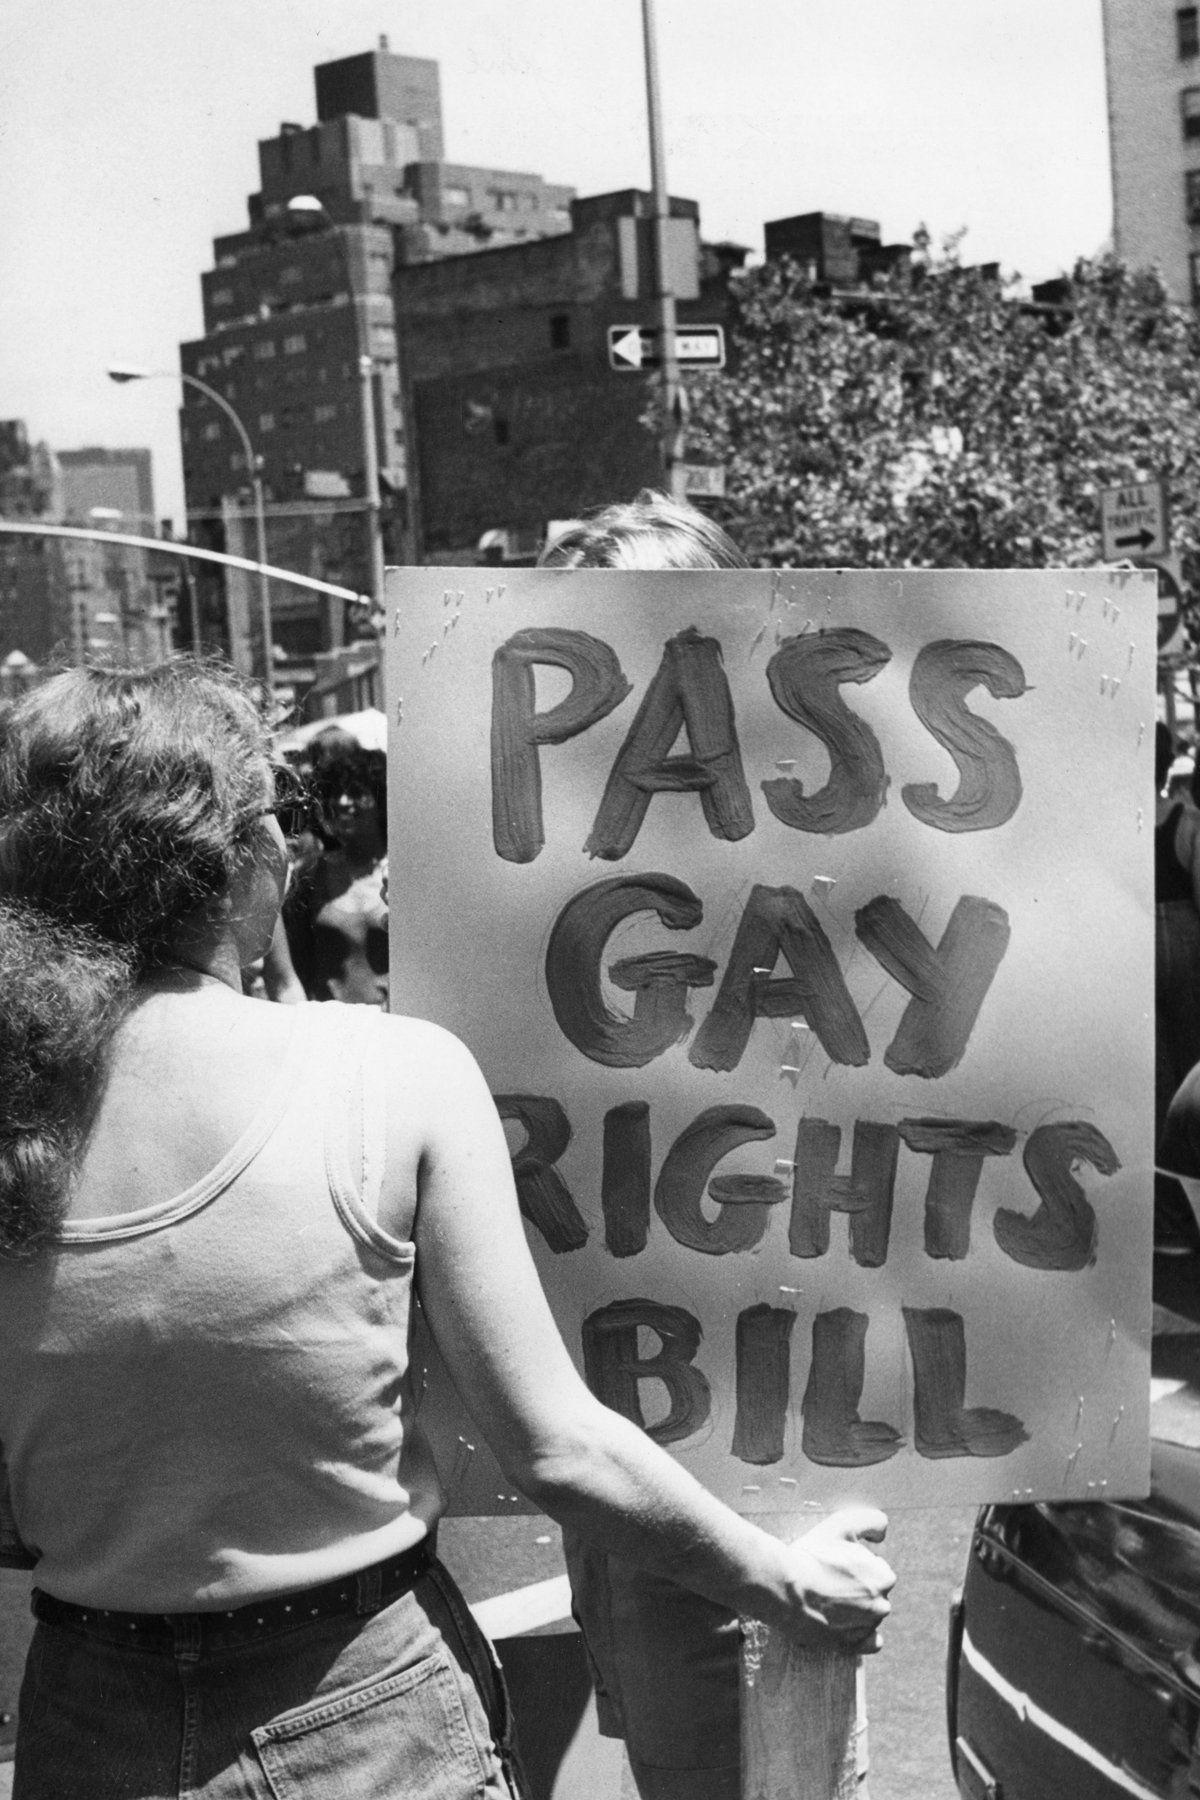 graff-FEO134-gayrights-tease-embed5